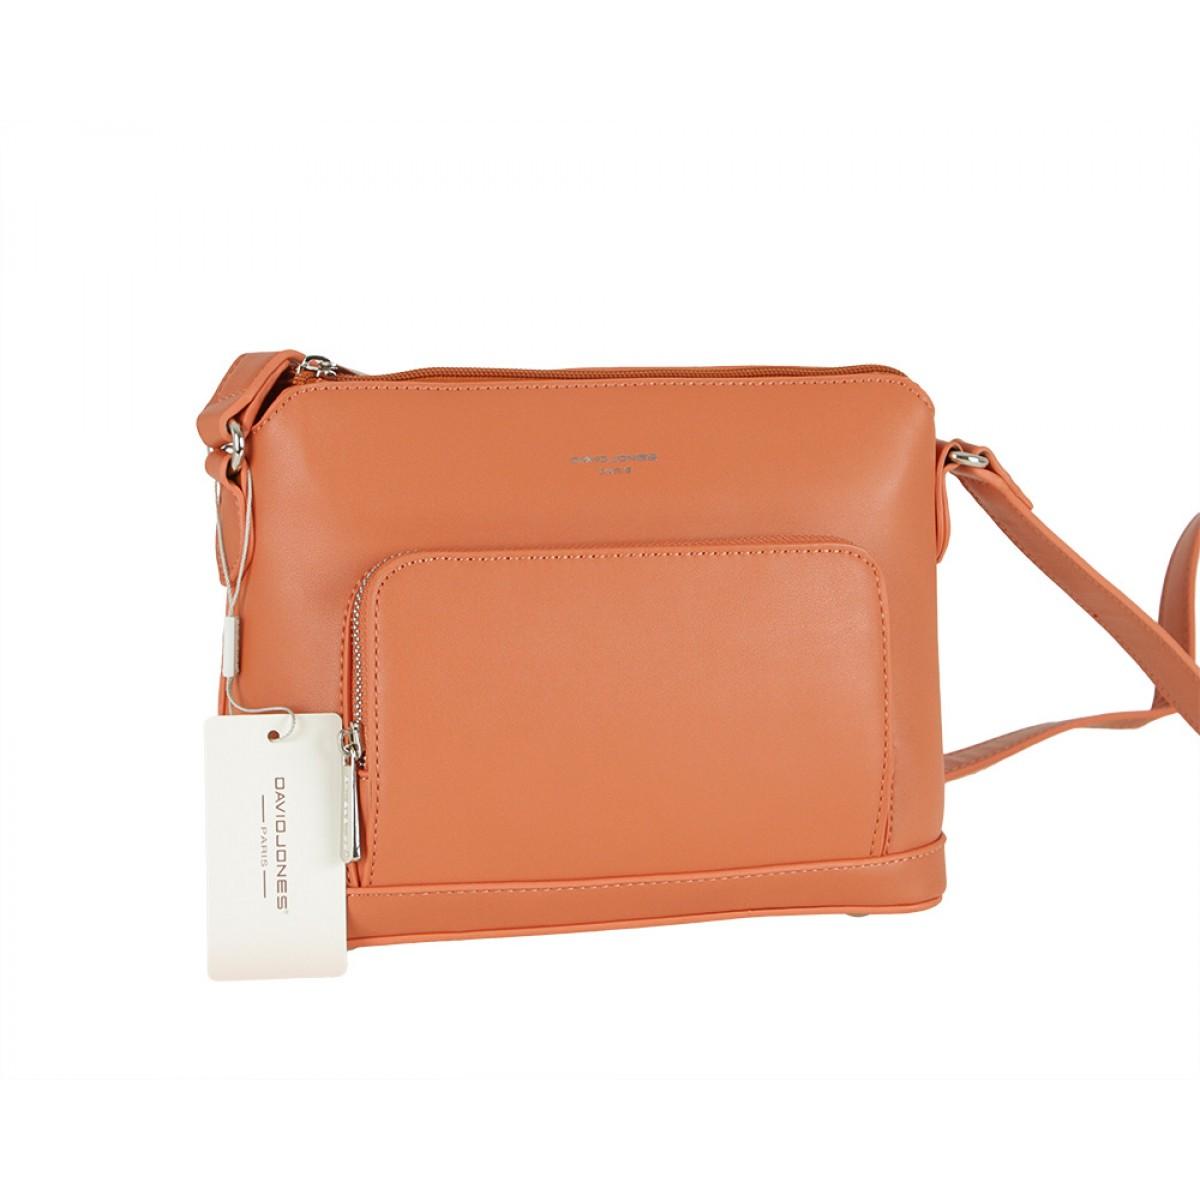 Жіноча сумка David Jones 6307-1 CORAL